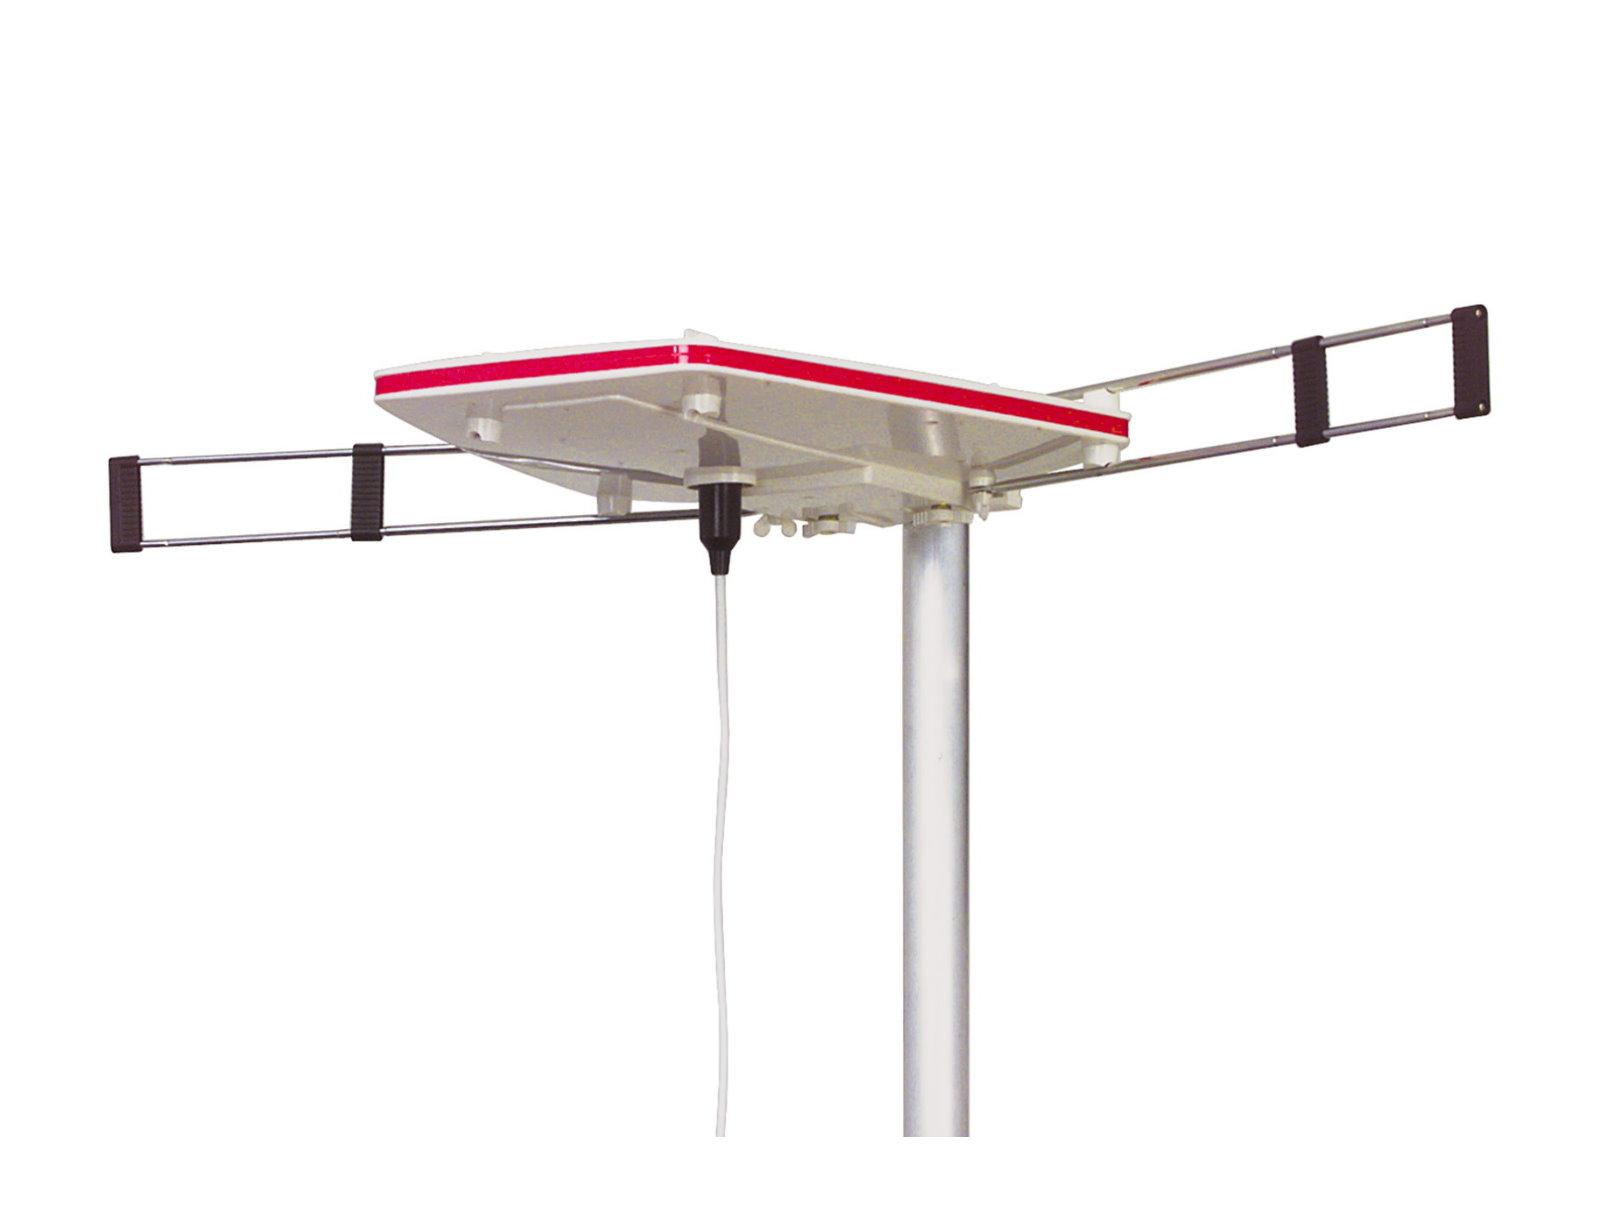 dvb t hausantenne dach aussen antenne outdoor wohnmobil. Black Bedroom Furniture Sets. Home Design Ideas